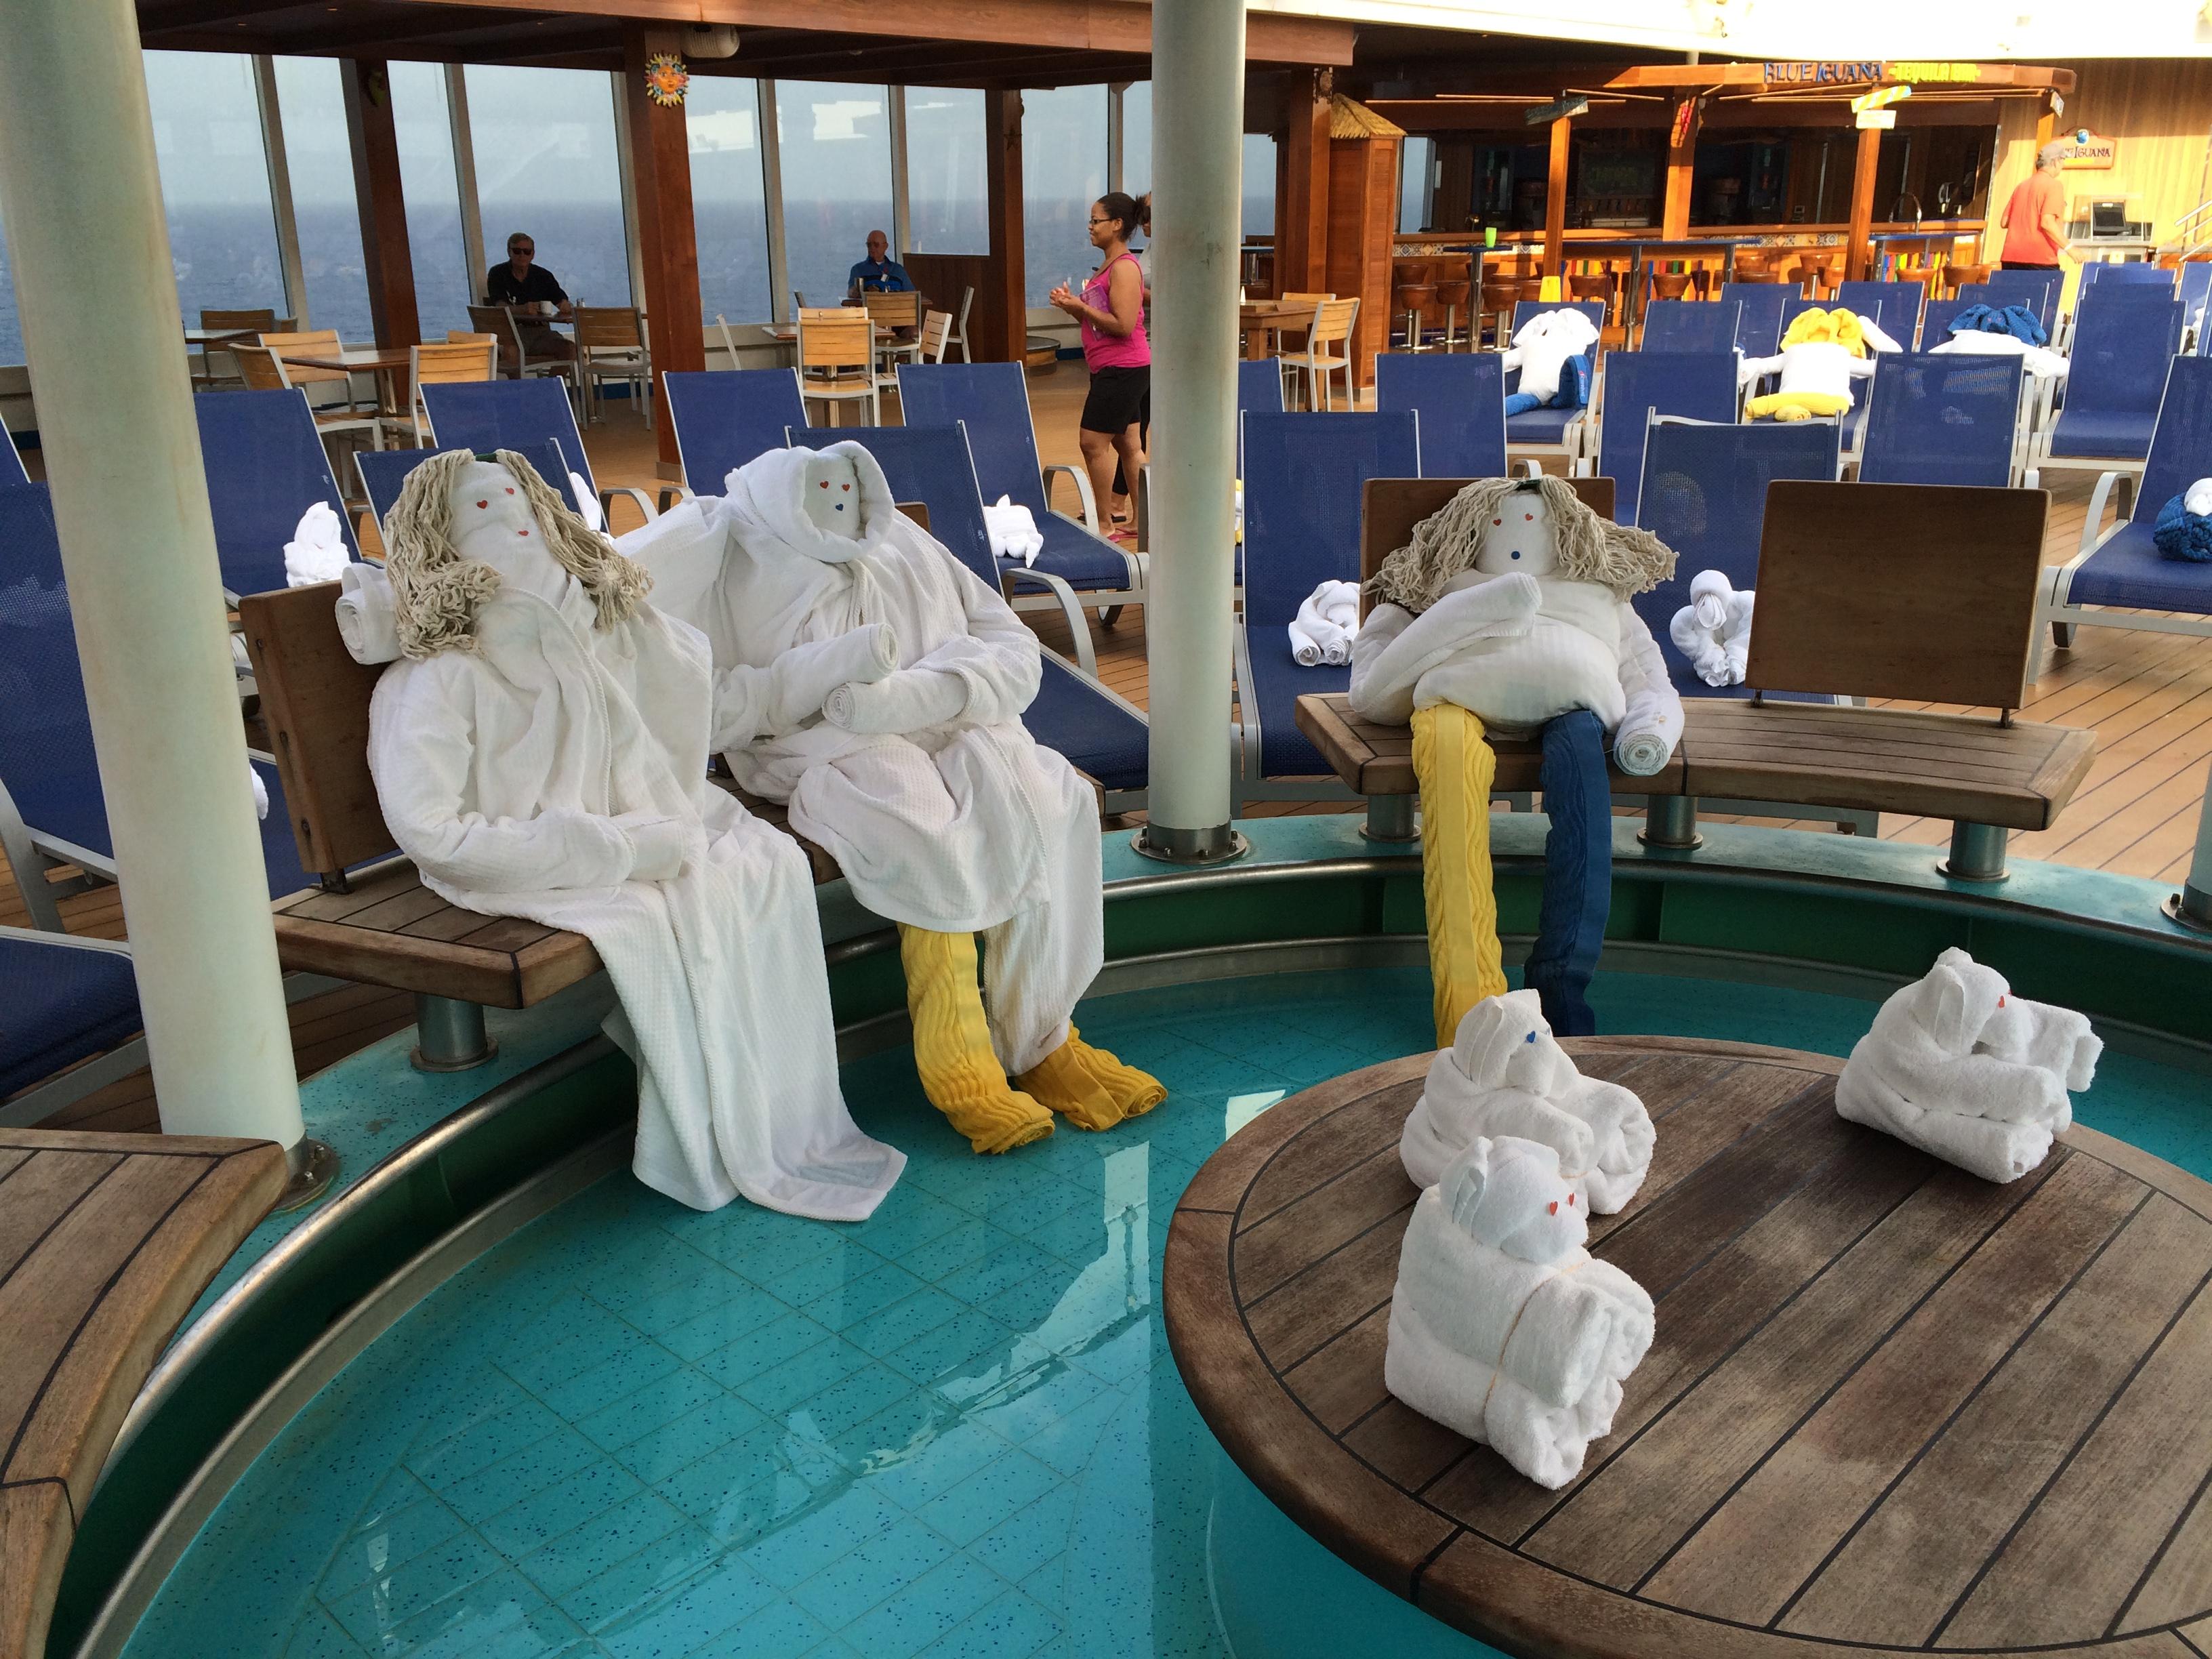 carnival cruise line magic